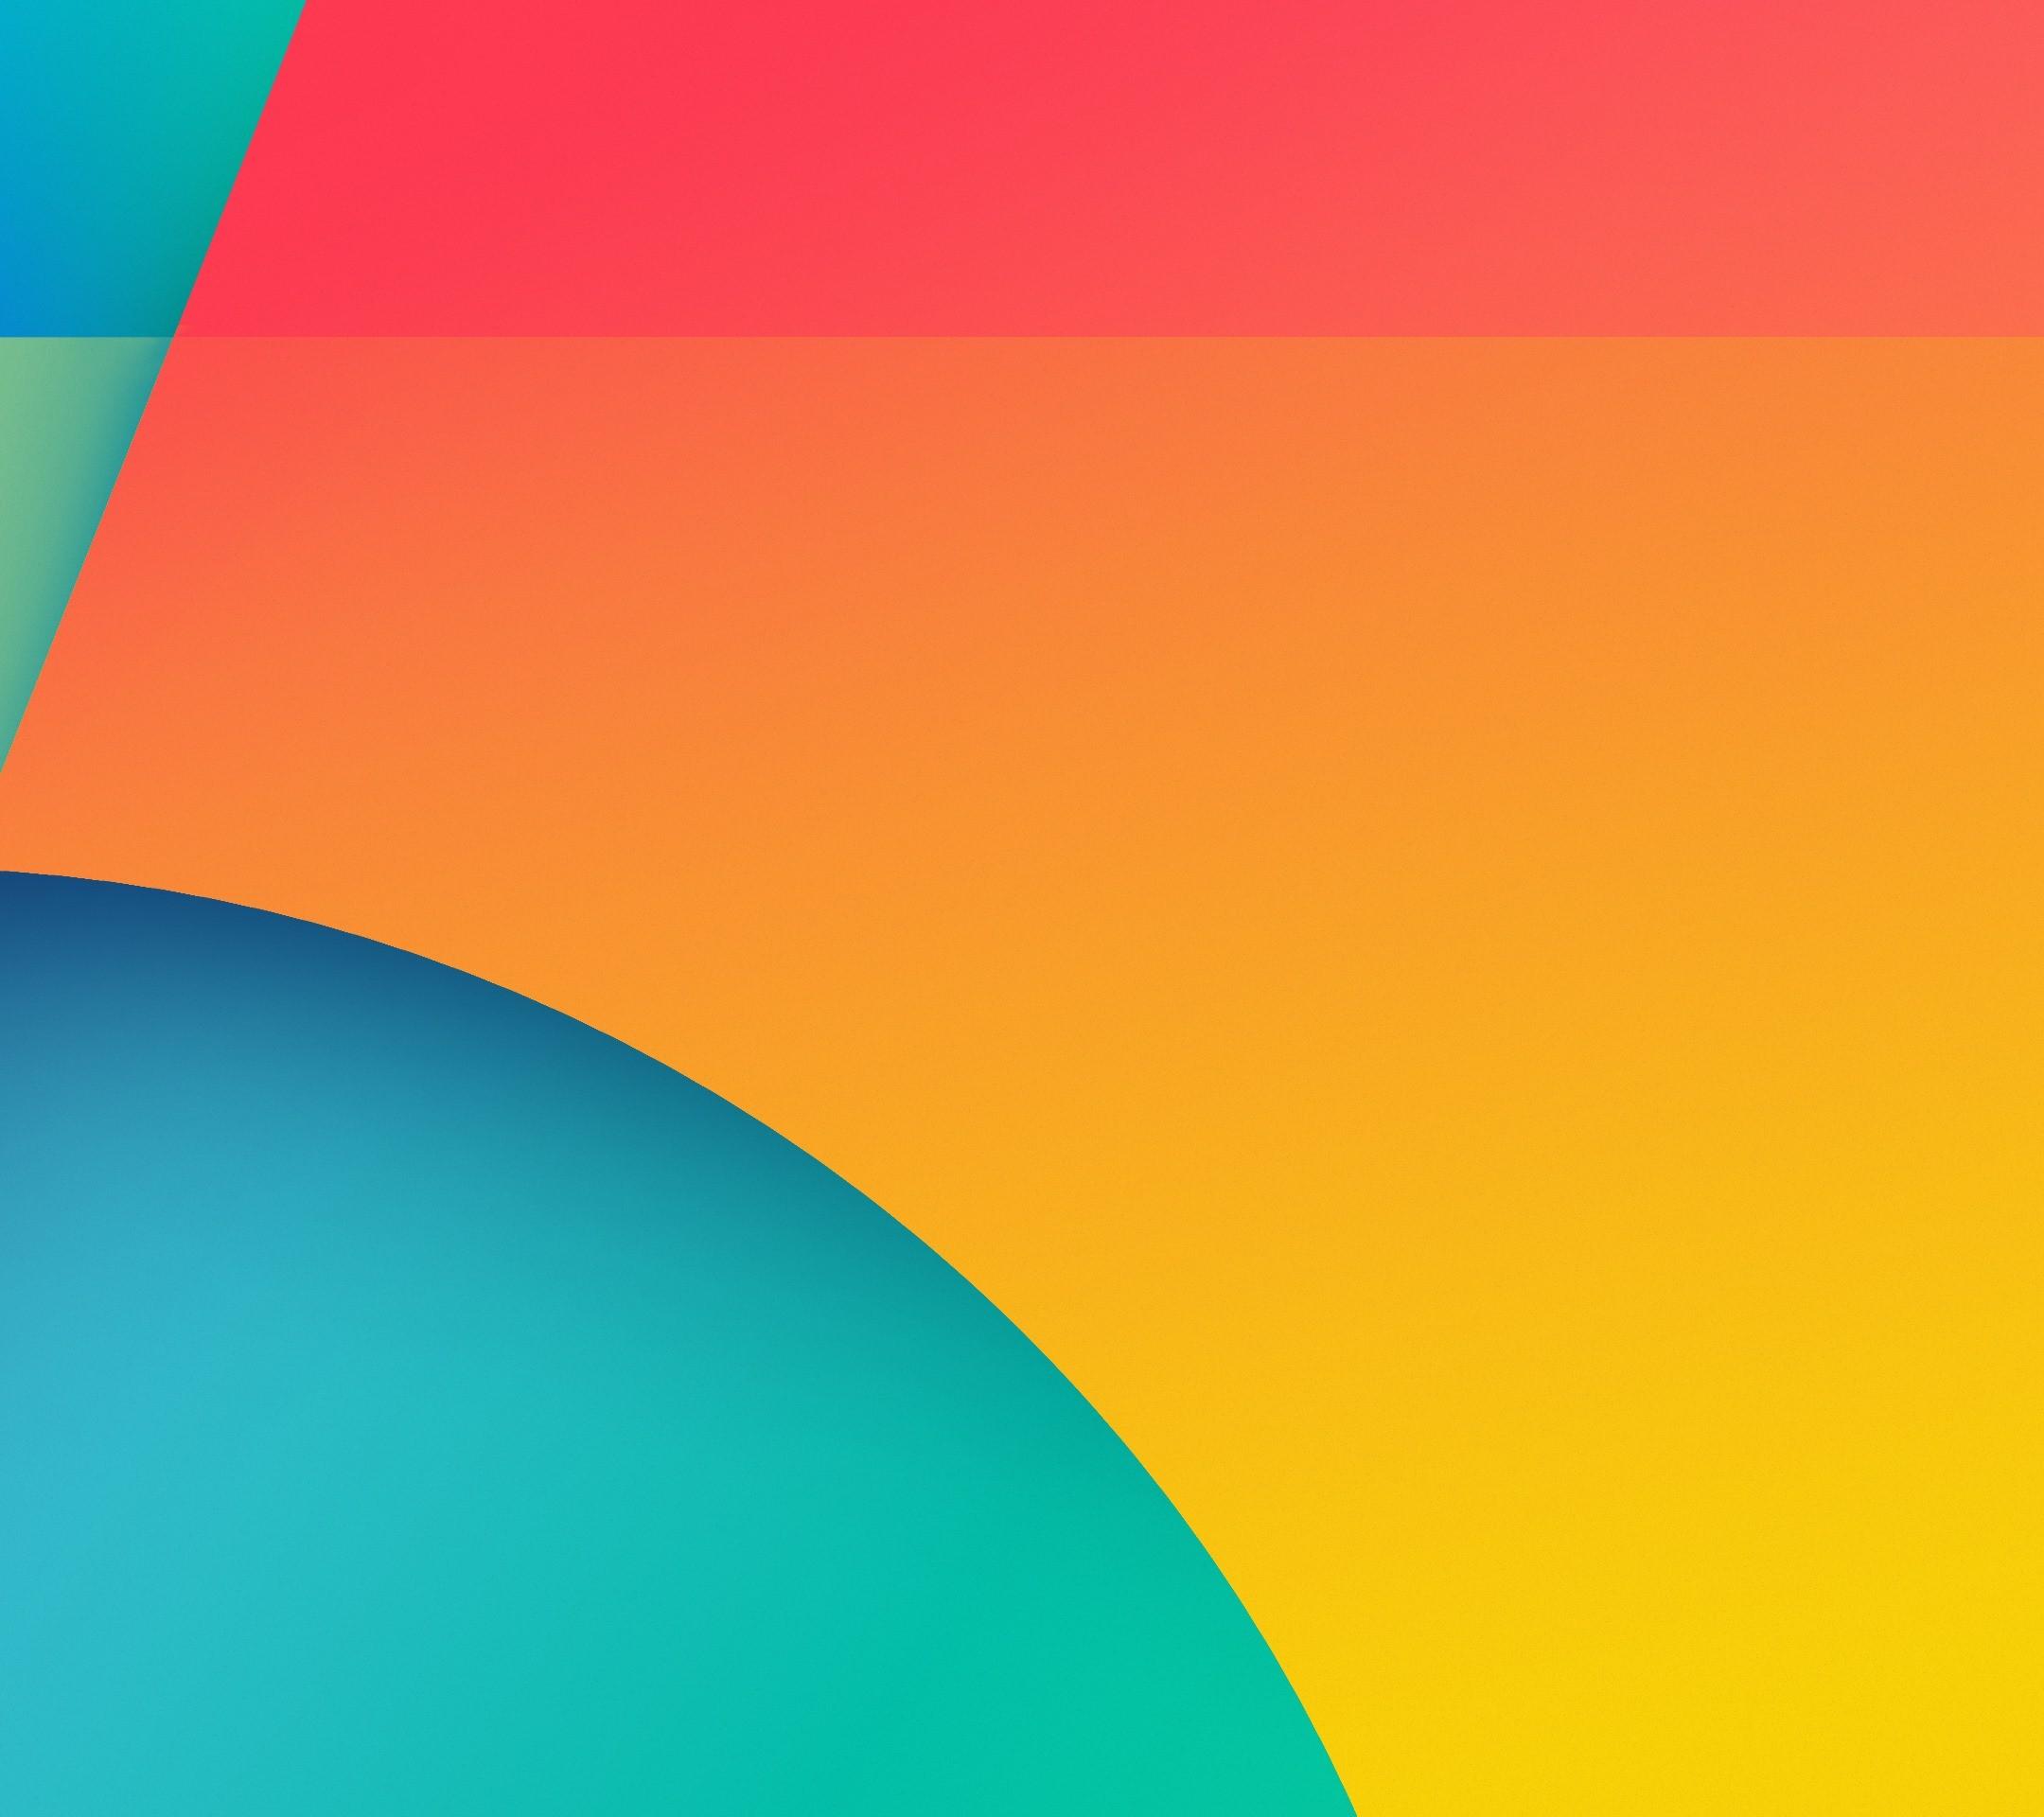 Nexus 7 HD desktop wallpaper : High Definition : Mobile